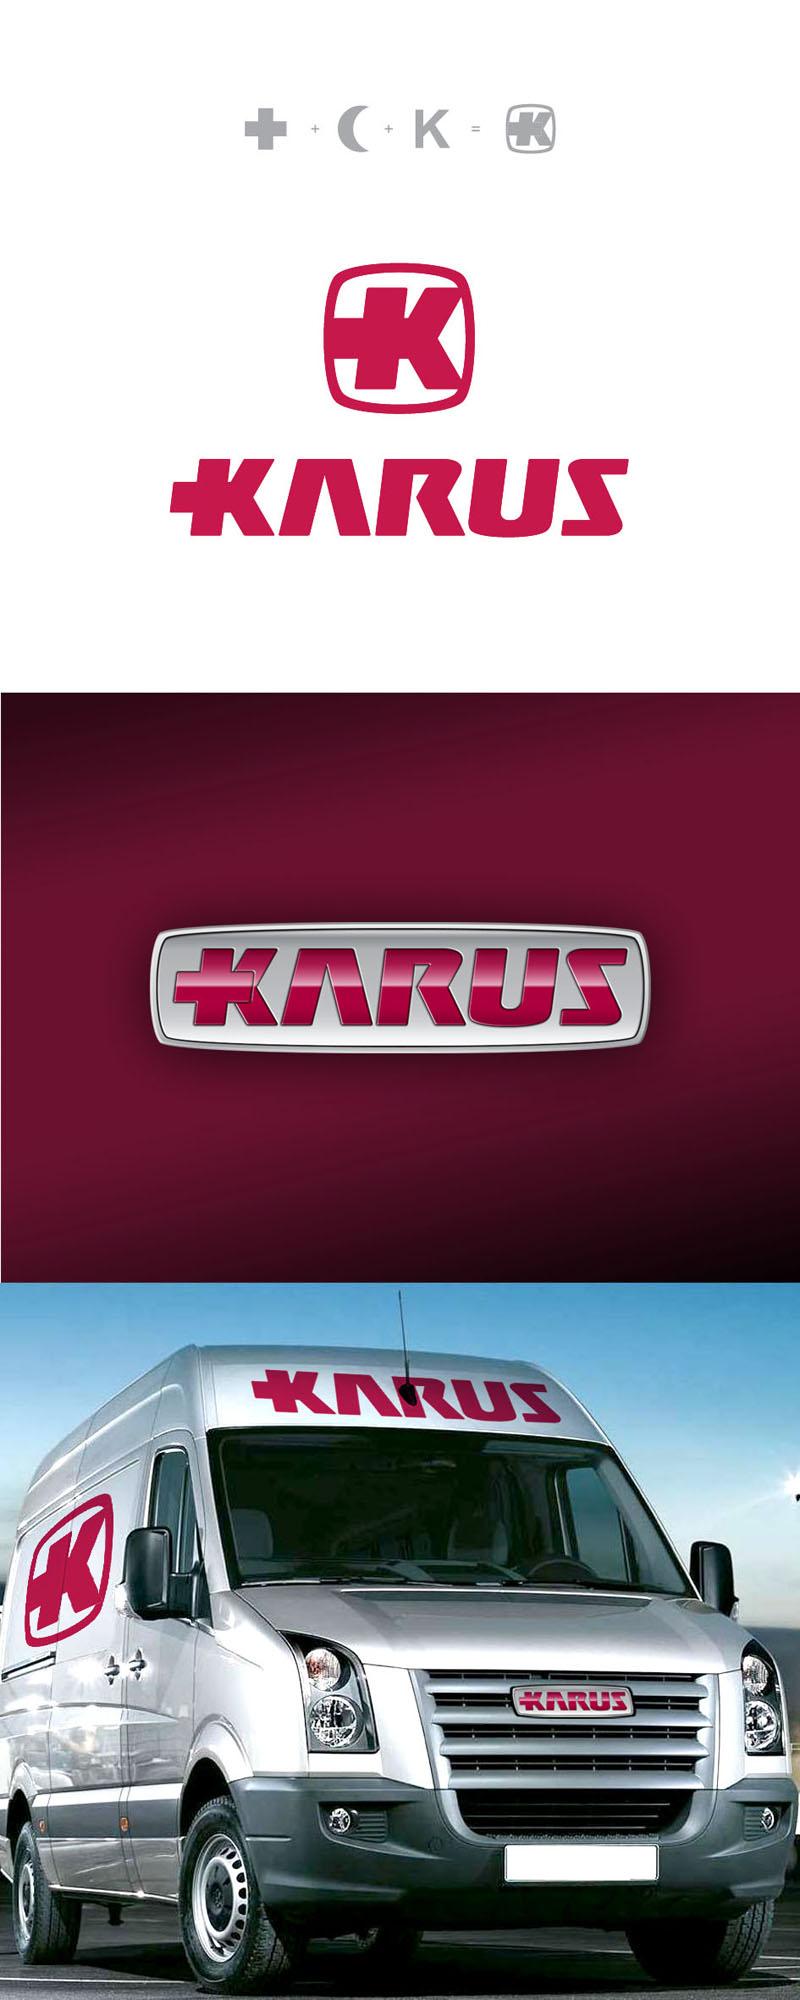 Разработка логотипа, фирменных цветов и фирменного знака фото f_9355343b3e9df602.jpg